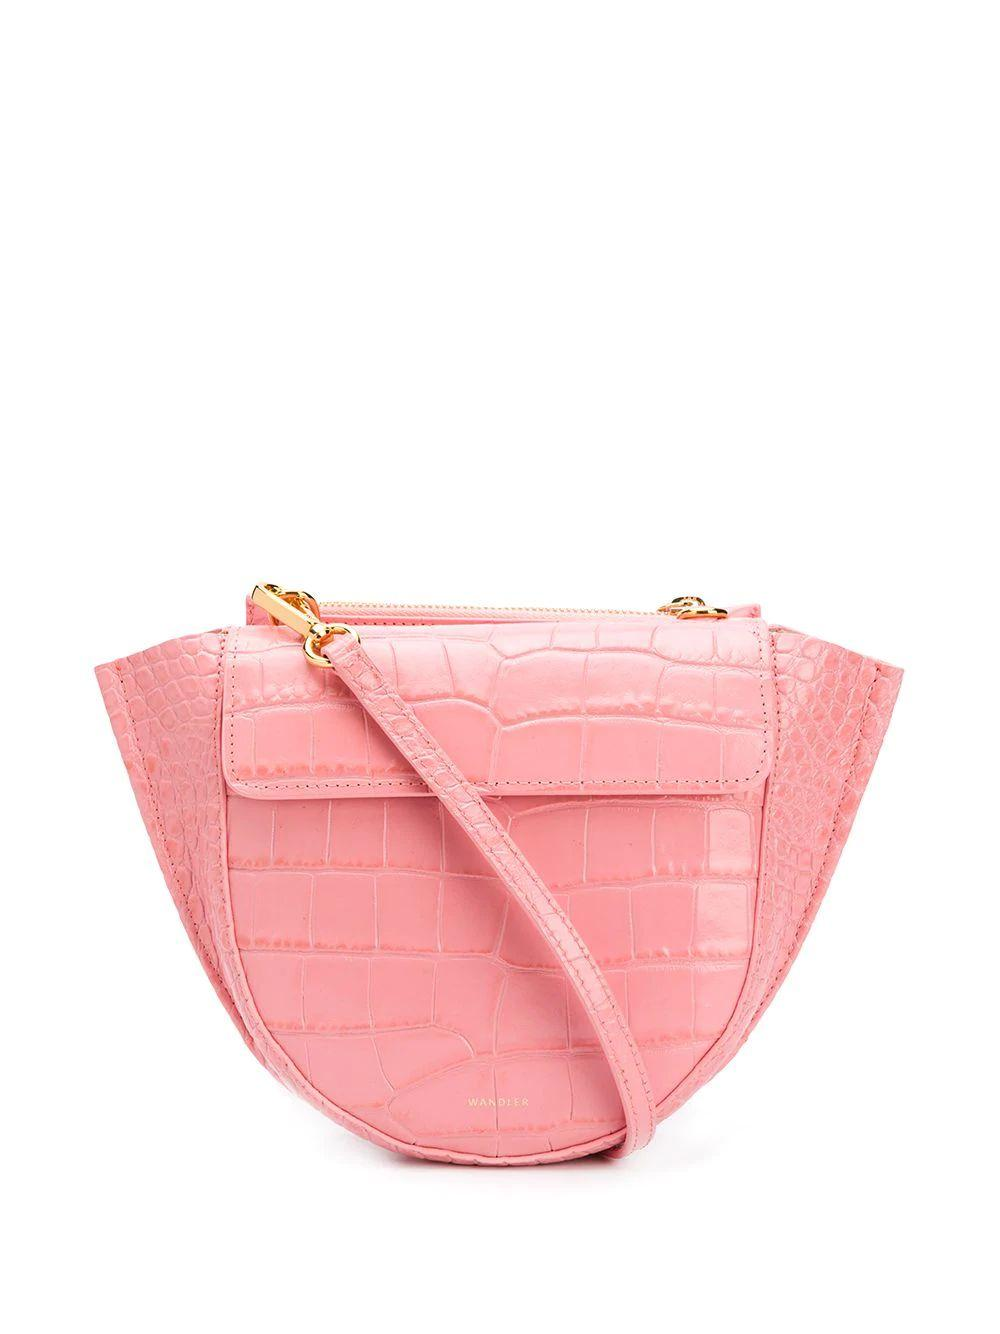 Hortensia Mini Shoulder Bag Item # HORTENSIA-MINI-B